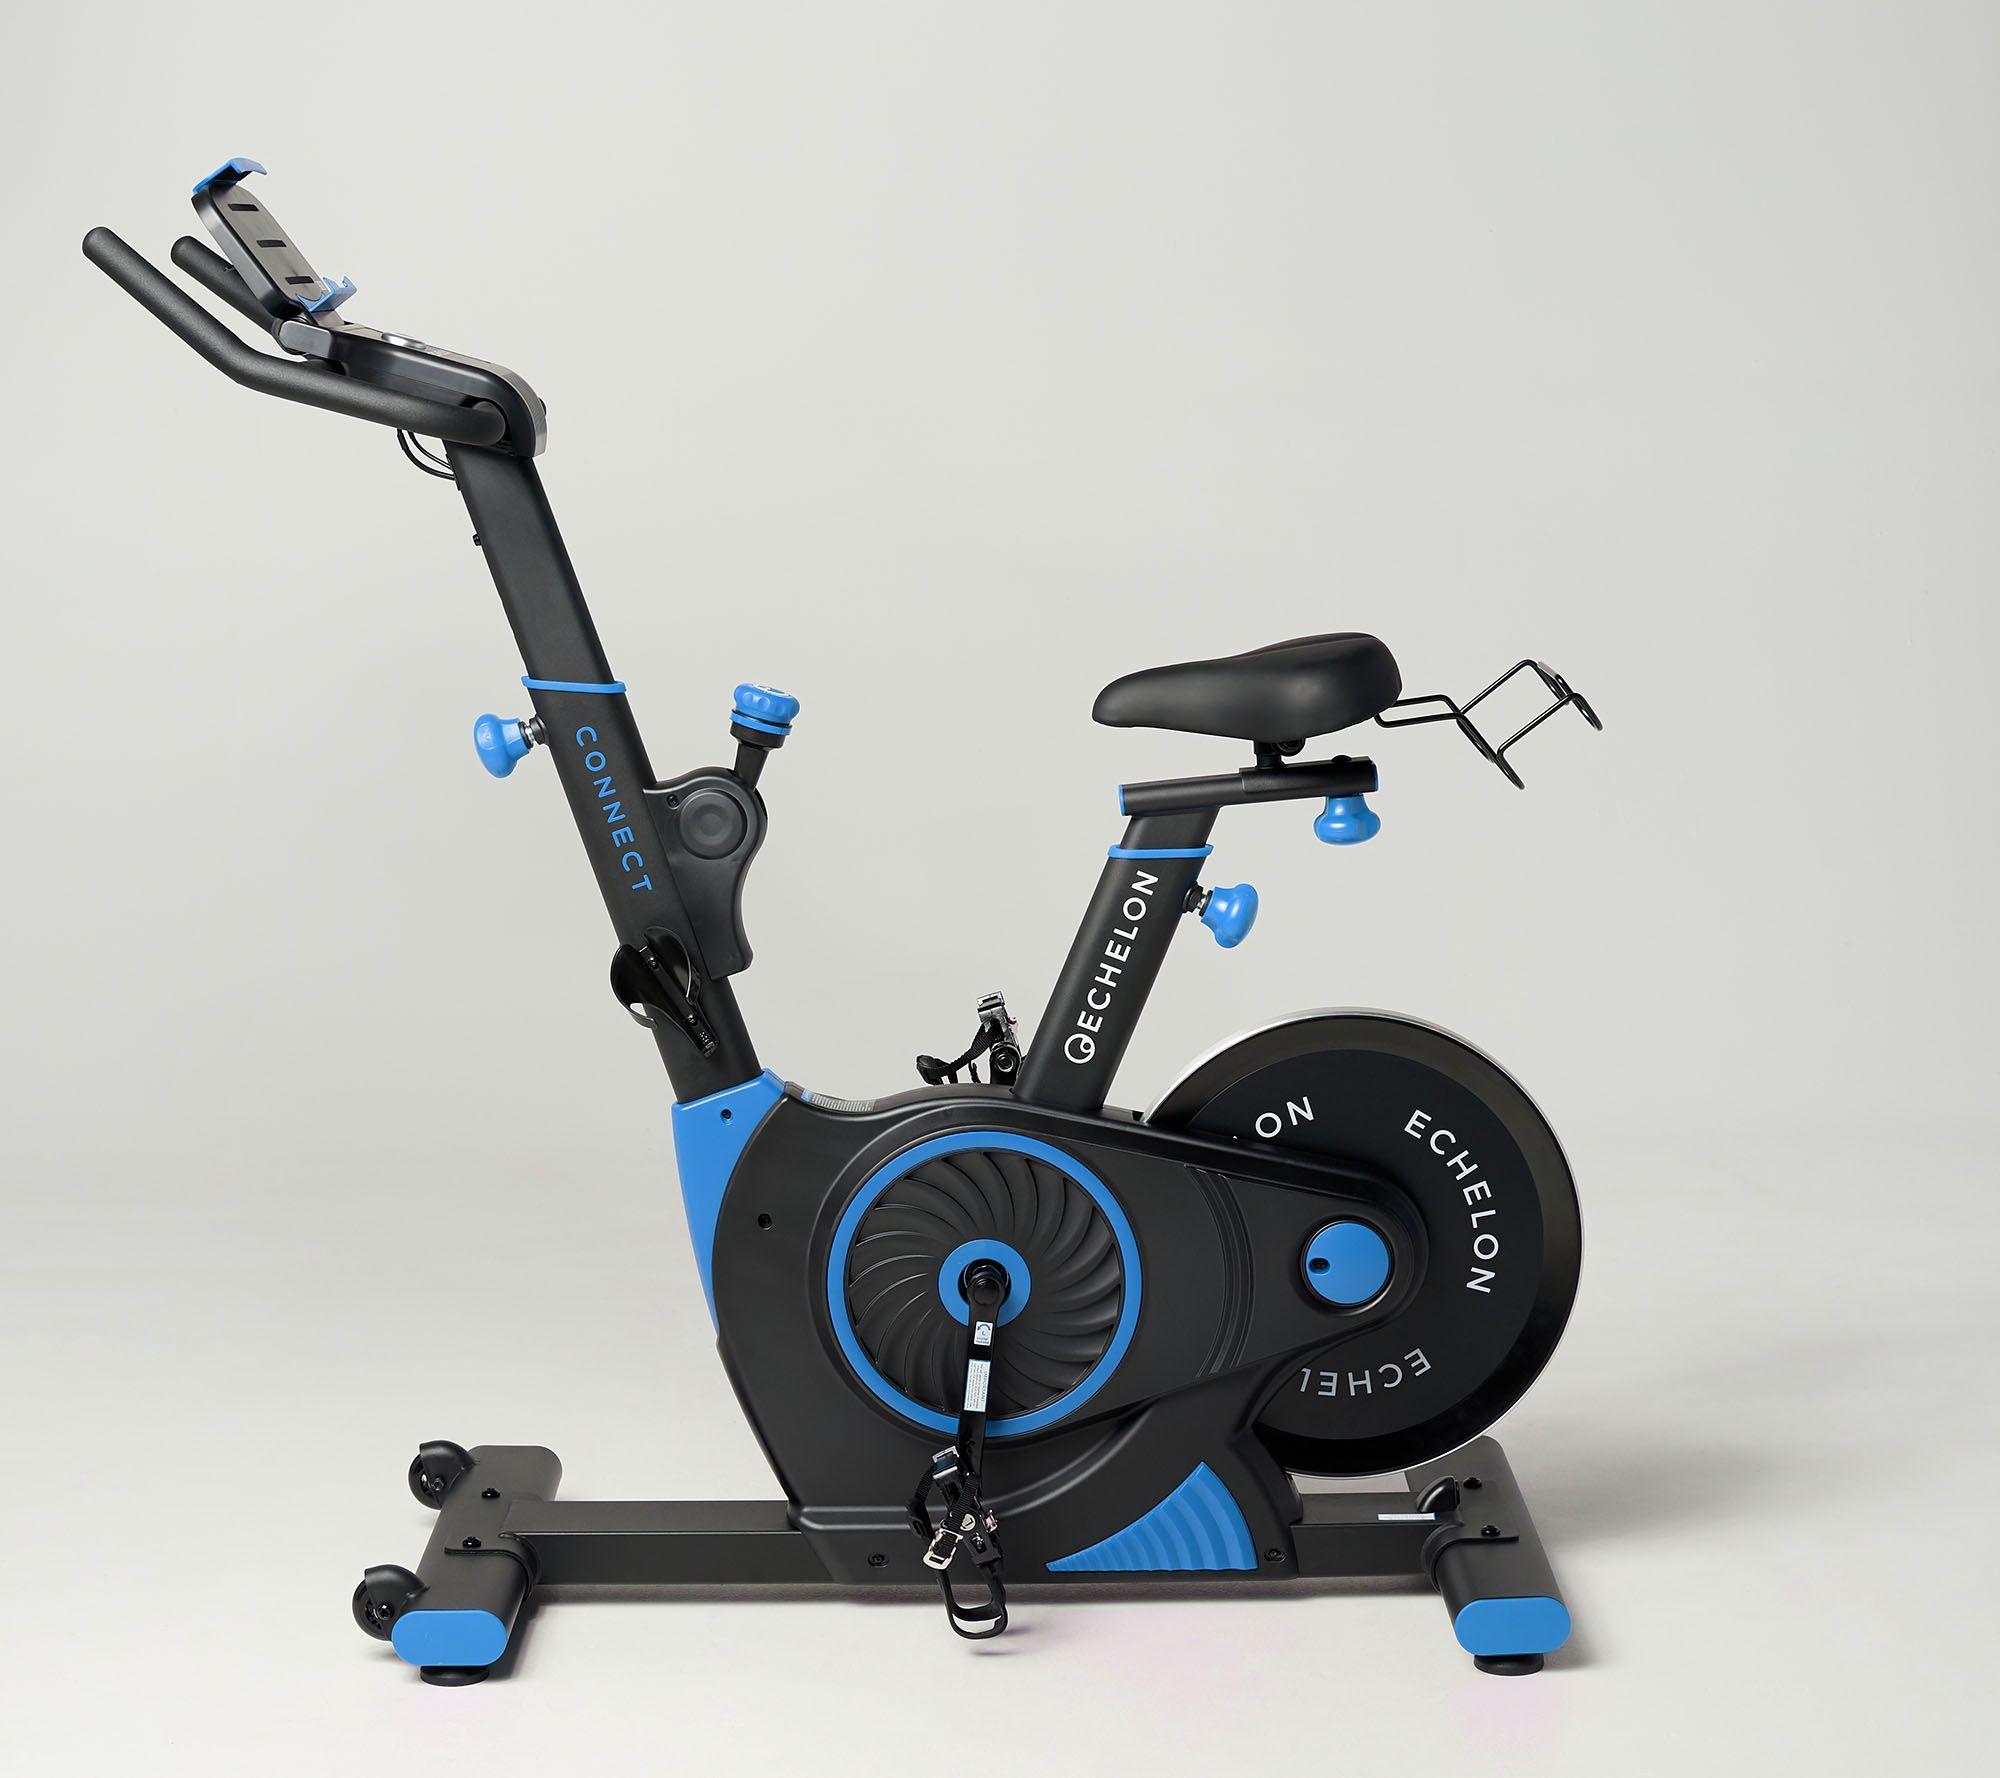 Echelon Smart Connect Exercise Bike W Echelon Workout App Page 1